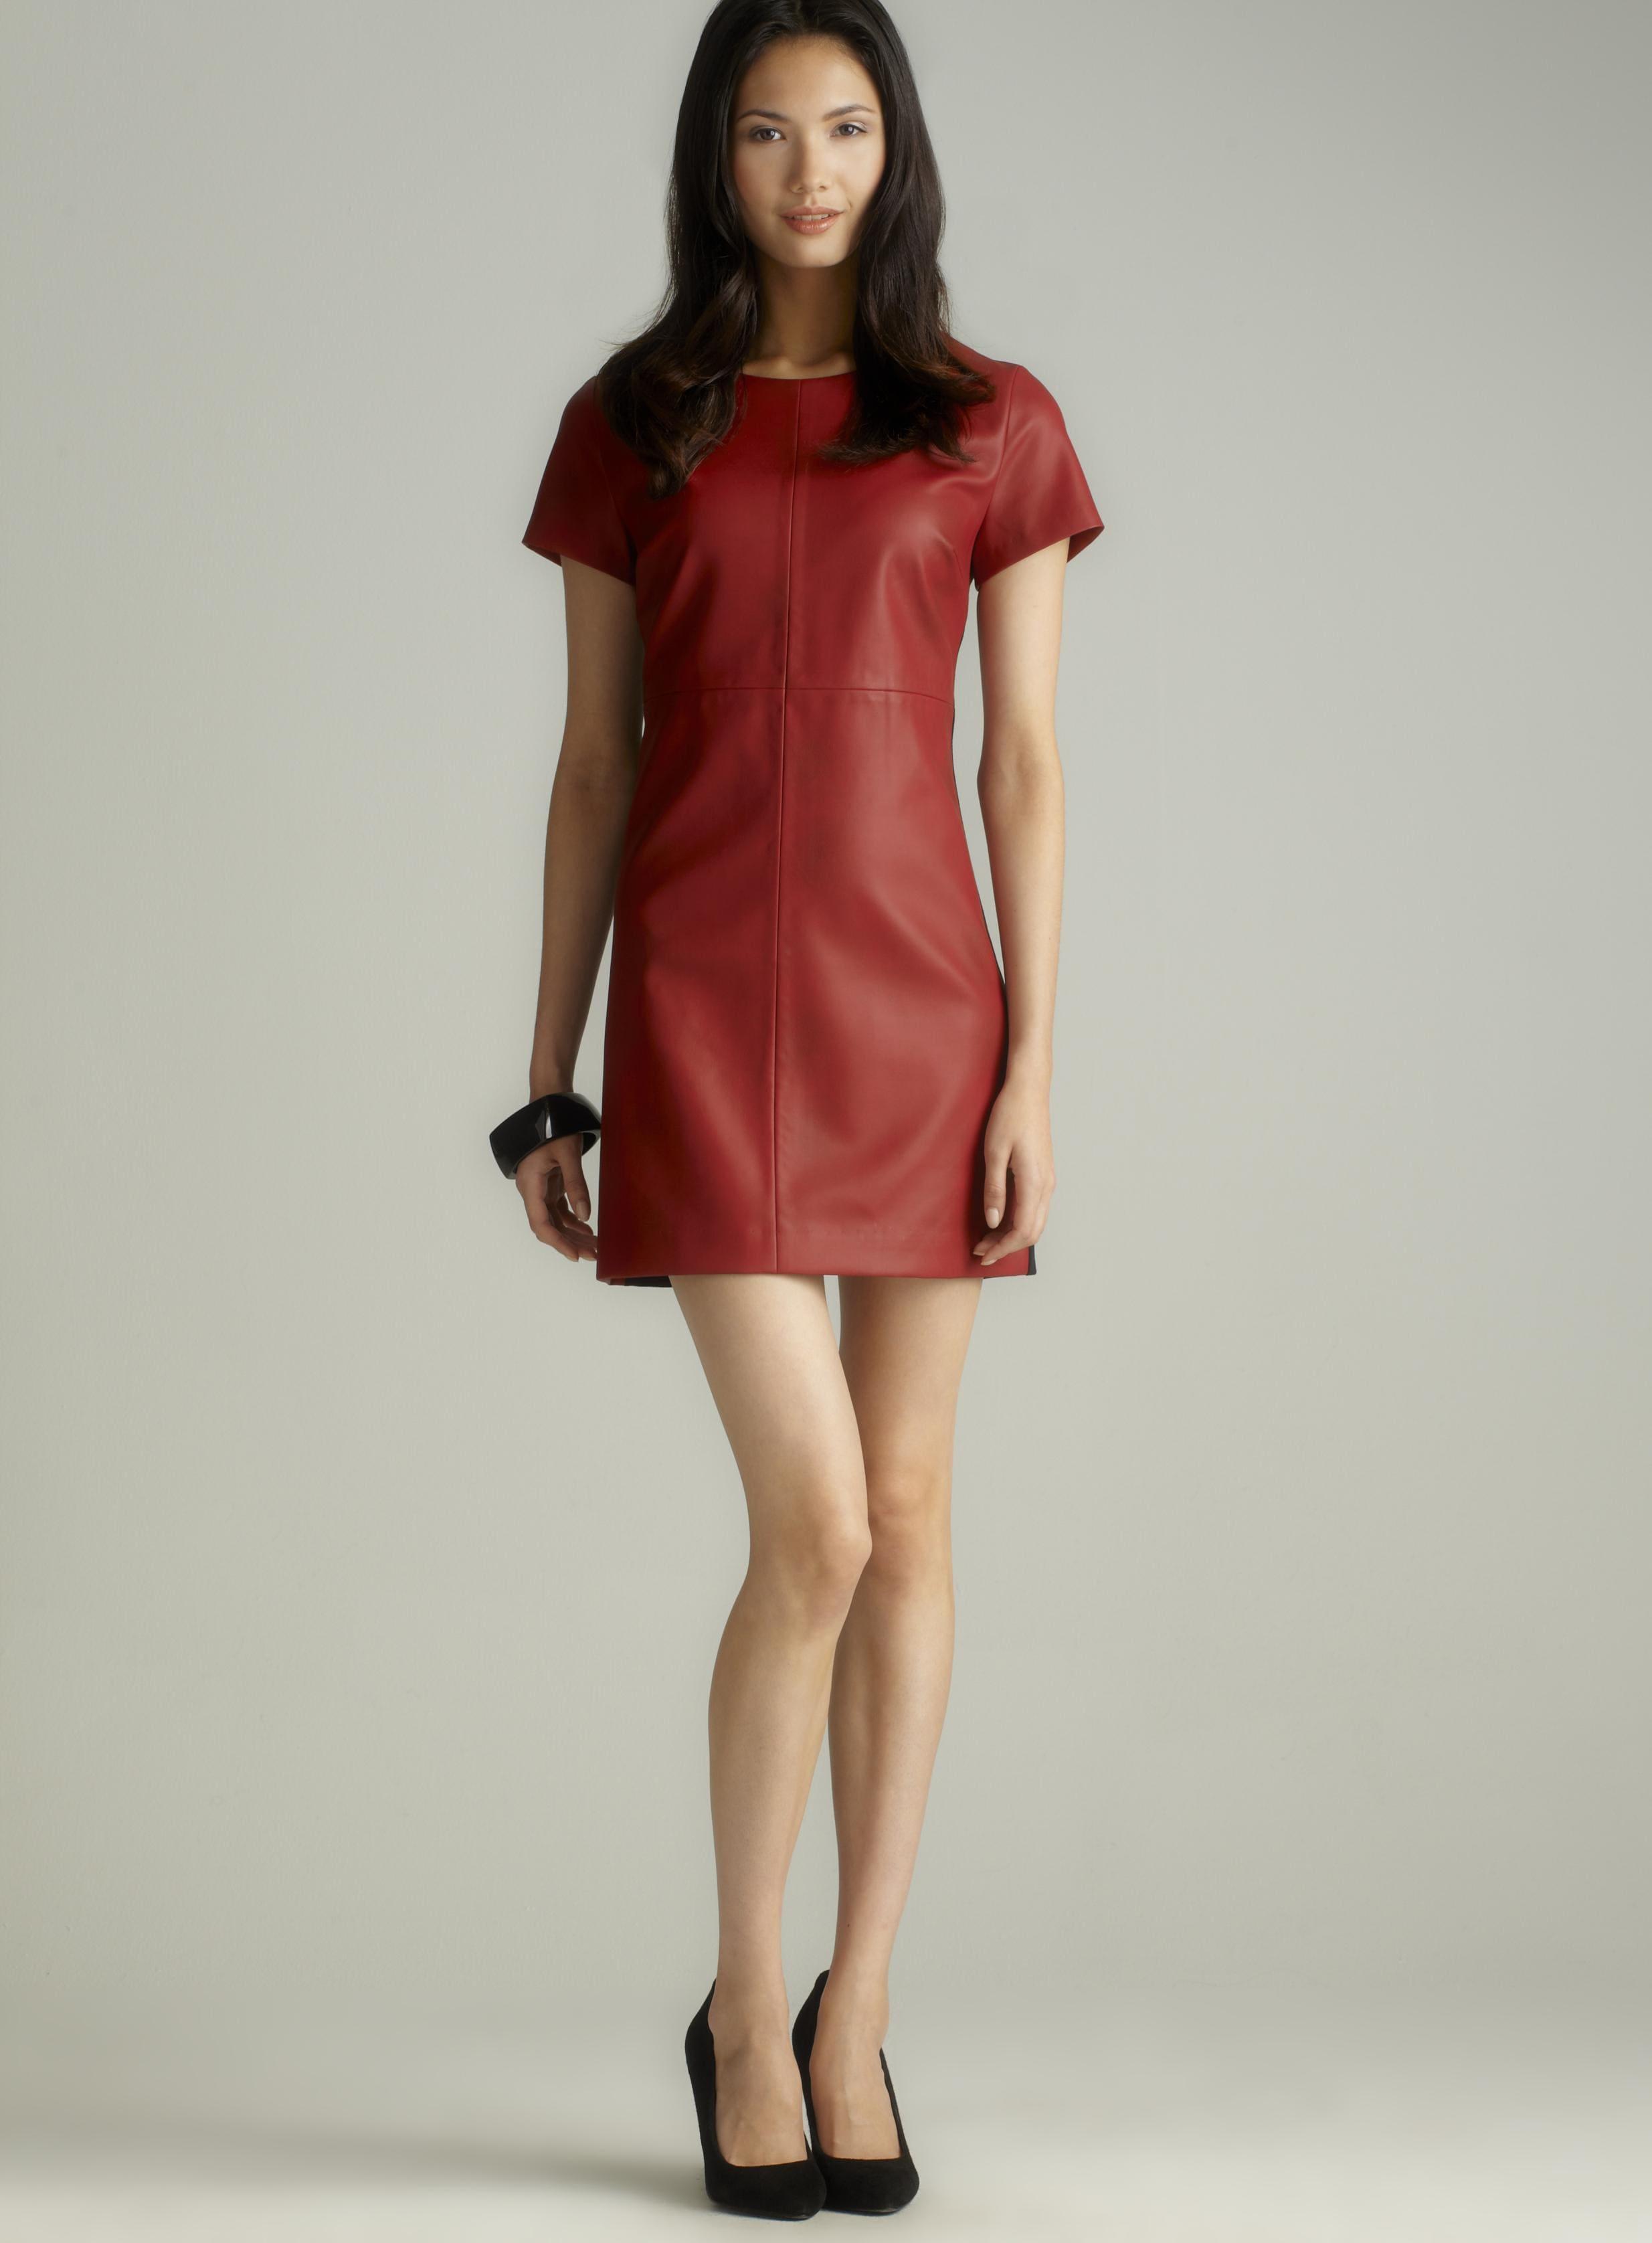 Jaye.e. Faux Leather Dress